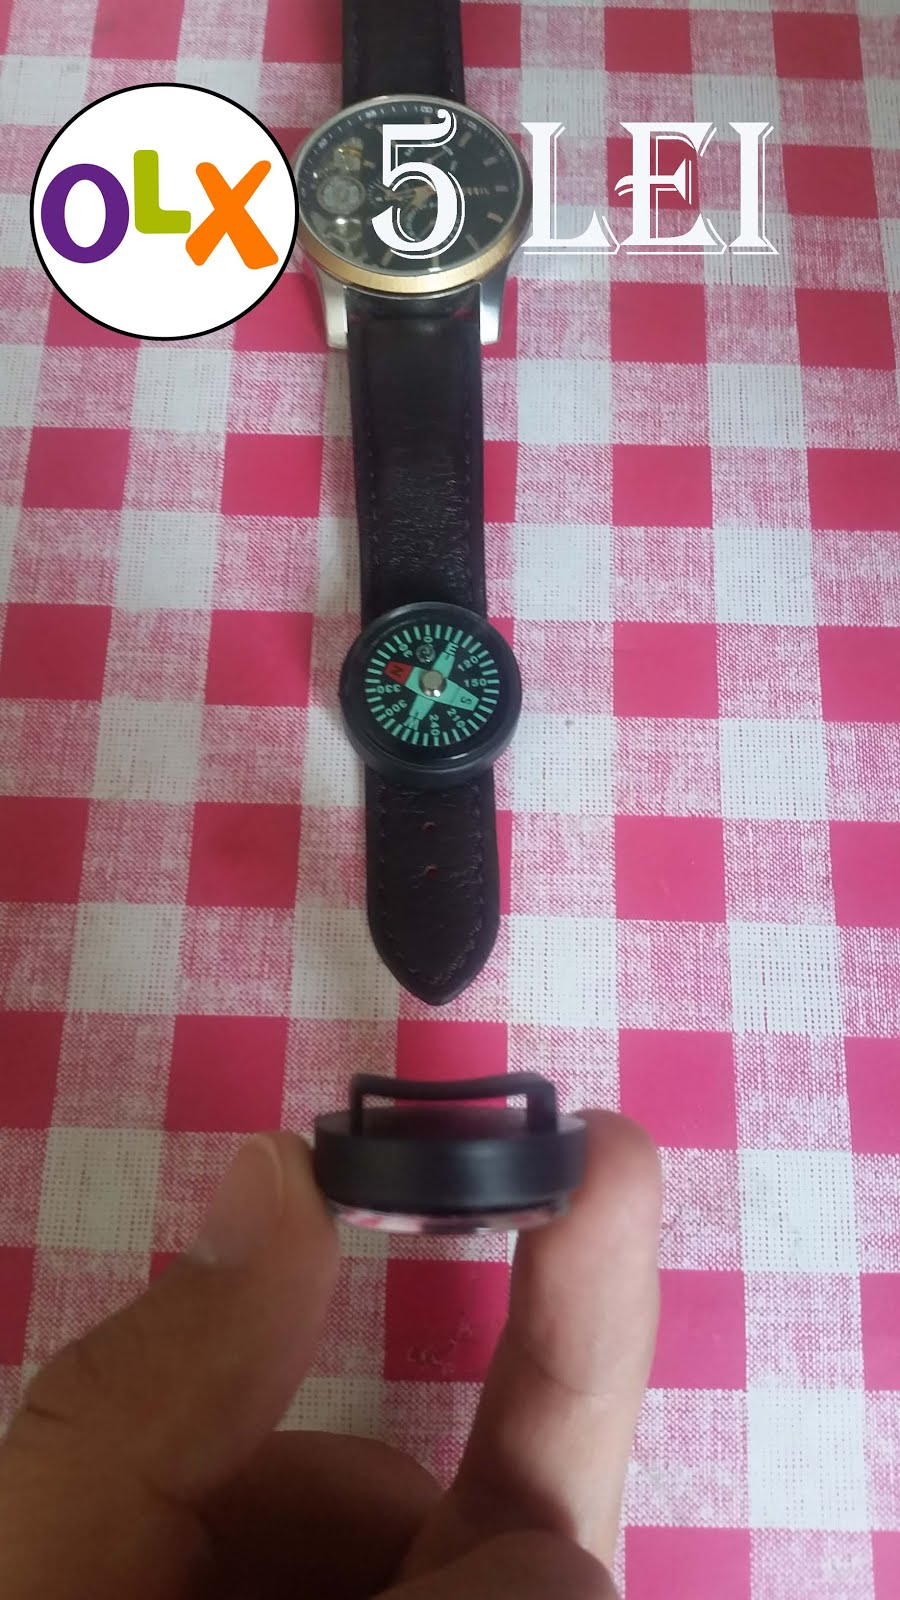 Busola ceas - 5 lei